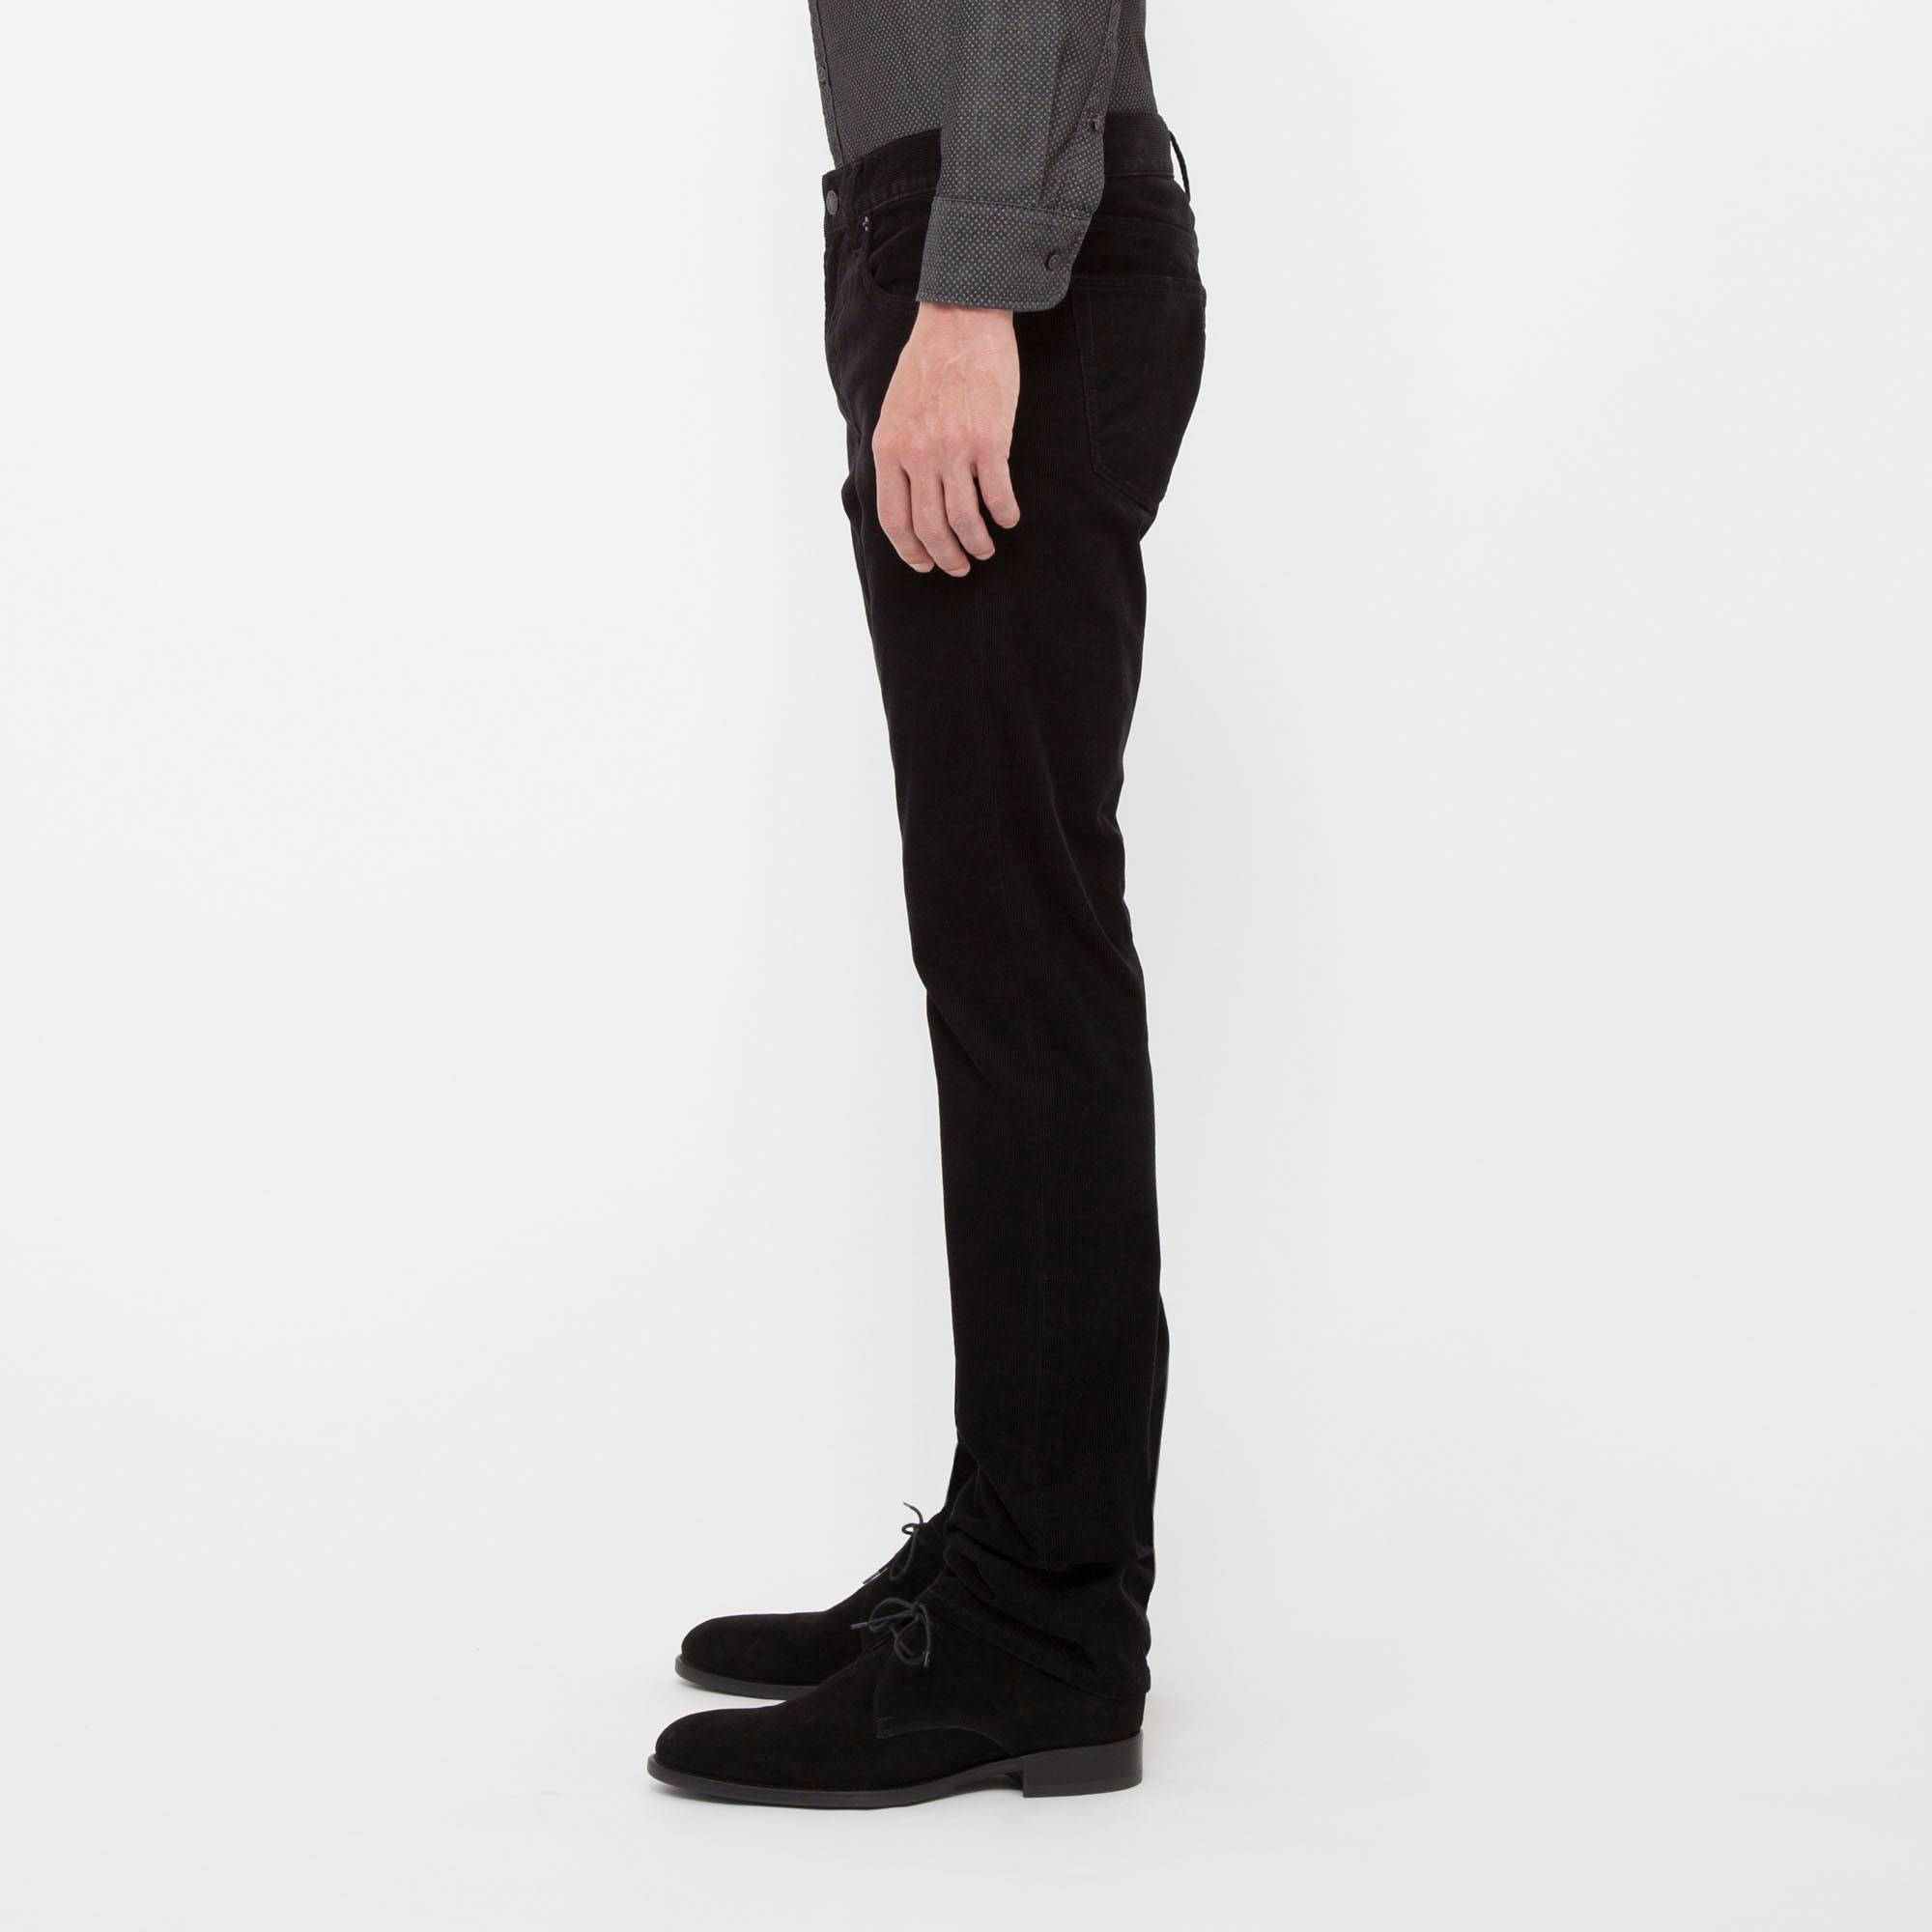 black skinny corduroy pants - Pi Pants